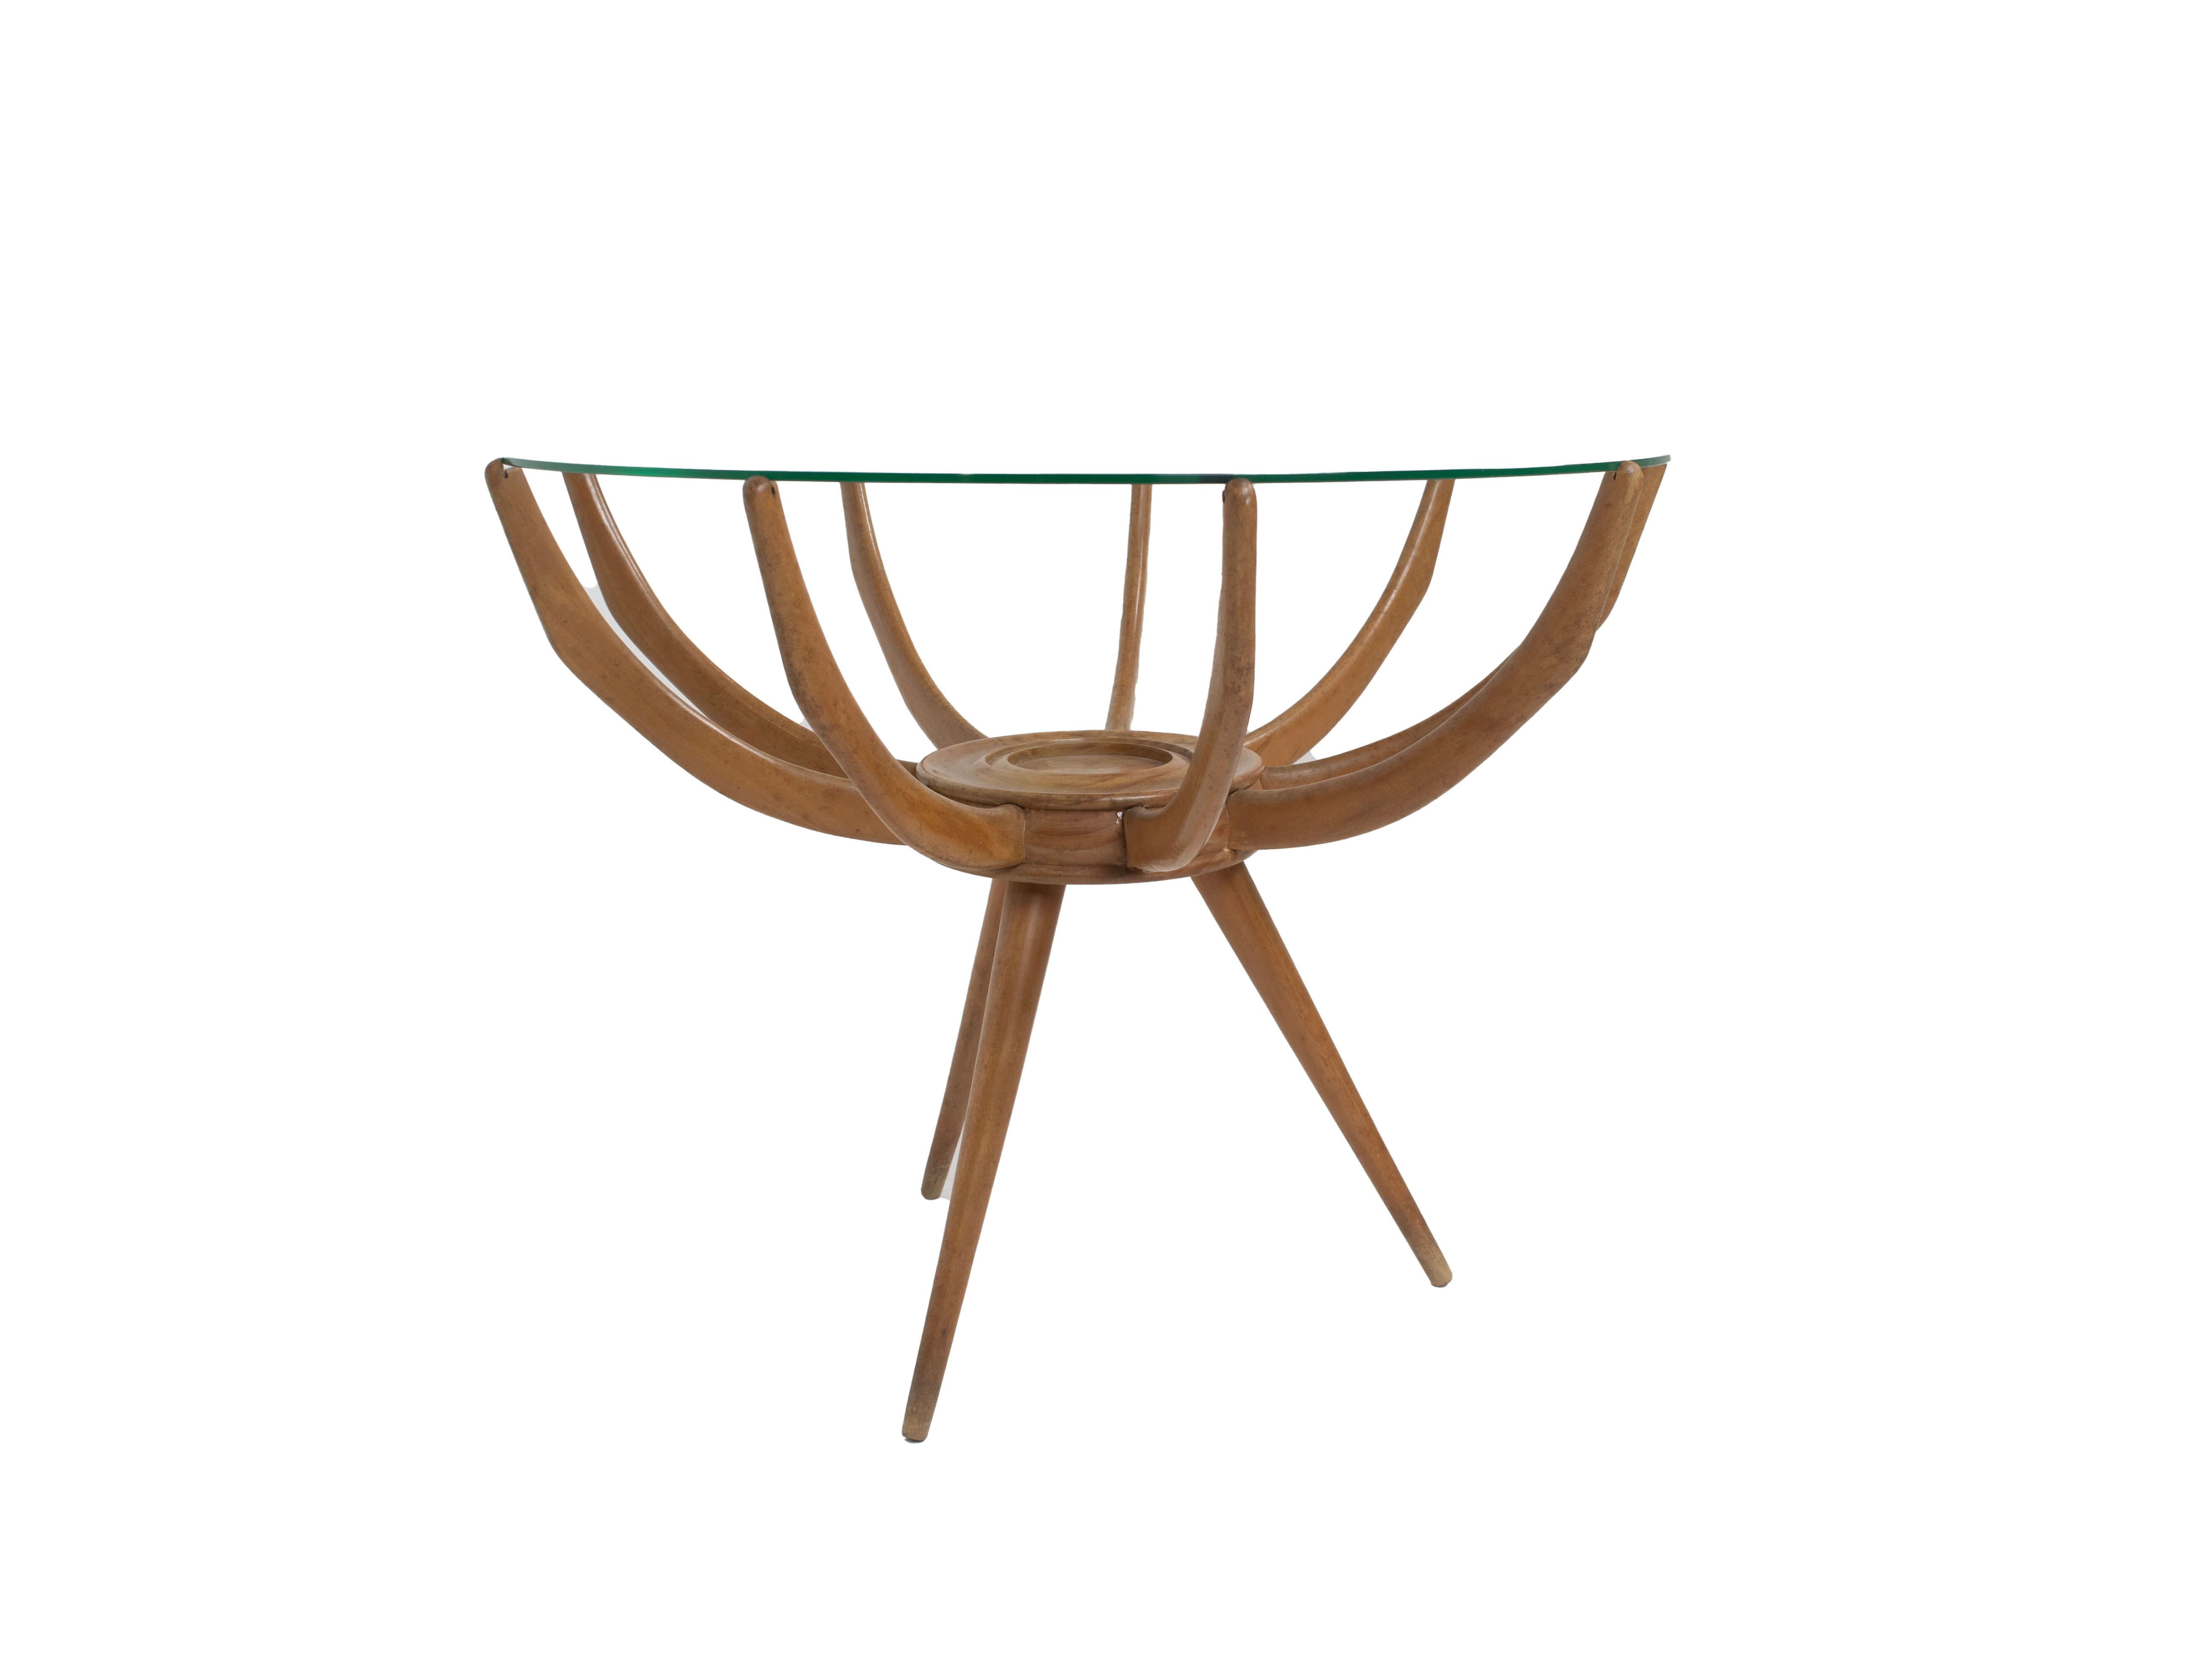 Spider Leg Coffee Table by Carlo di Carli, Italy 1950s